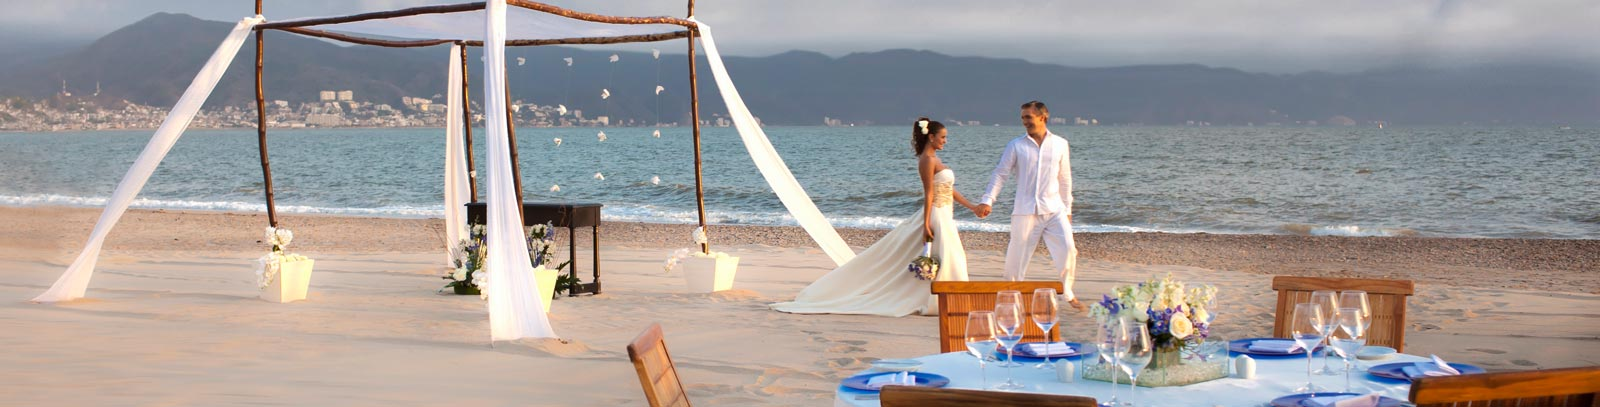 Grand Velas Riviera Nayarit offering Wedding Package